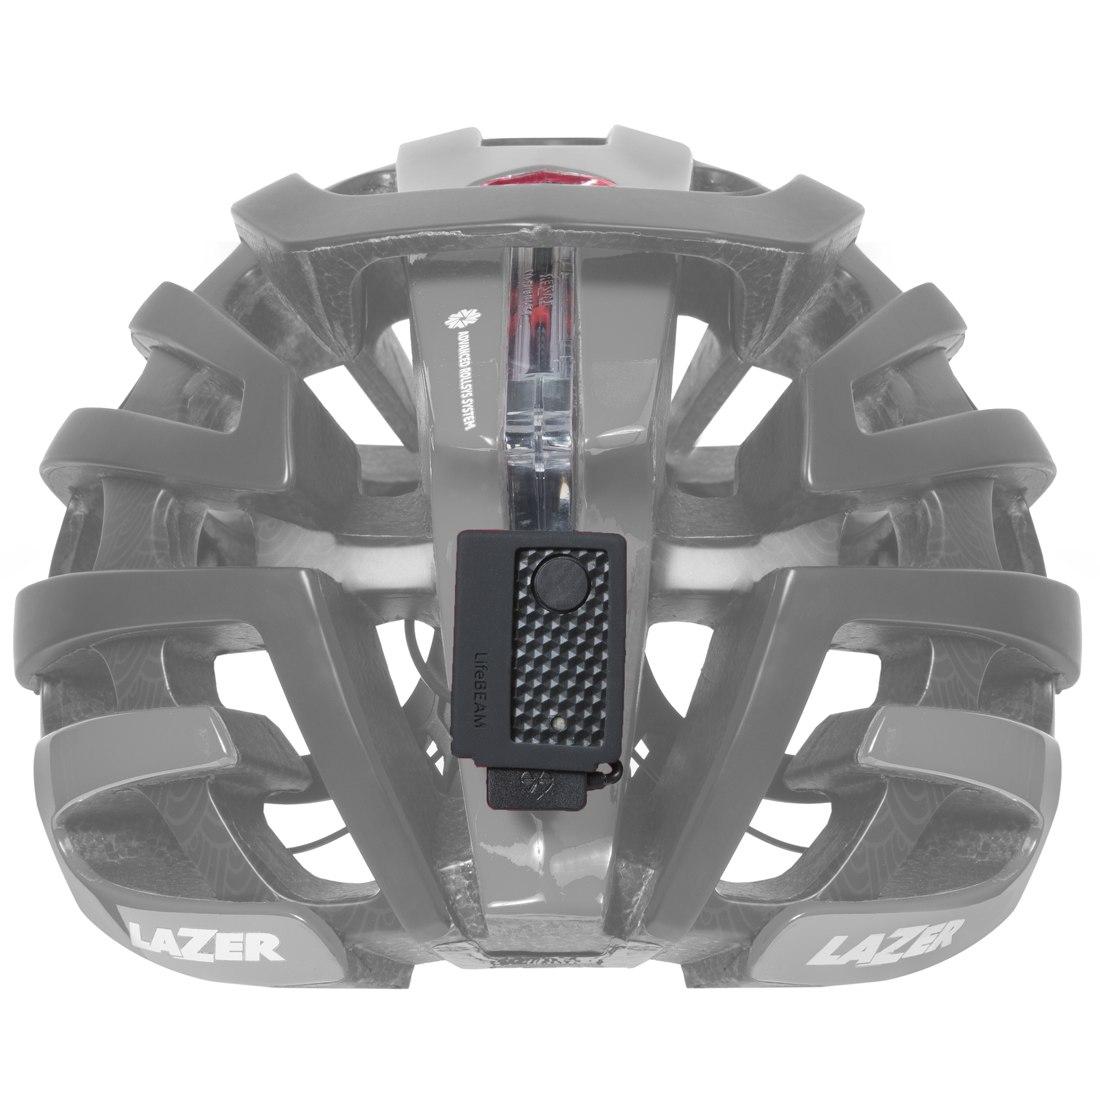 Image of Lazer Z1 Lifebeam Kit